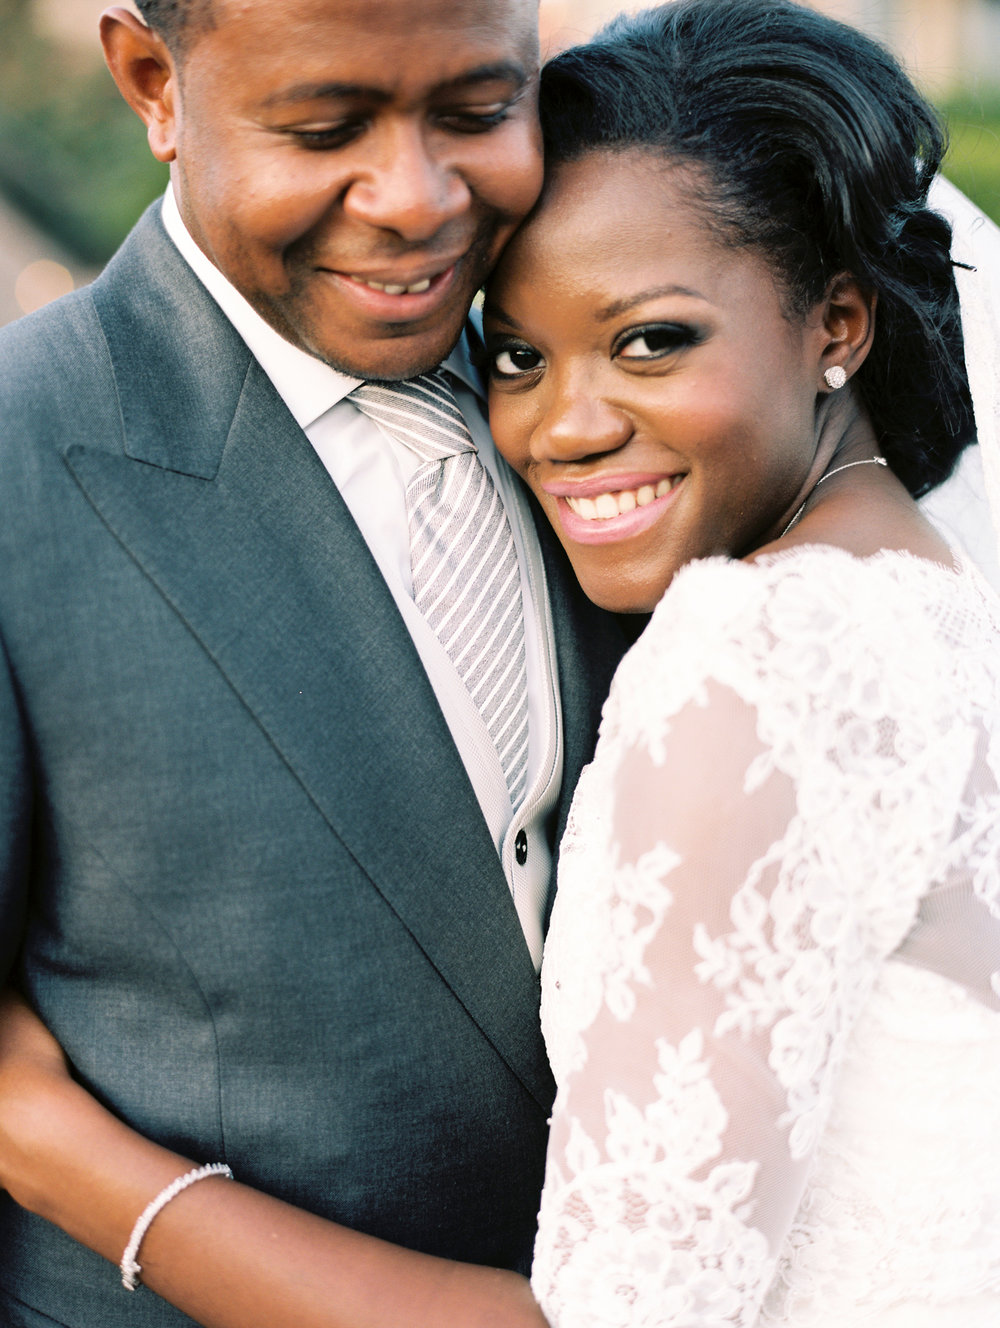 0025_Royal_Oaks_Country_Club_Wedding.jpg